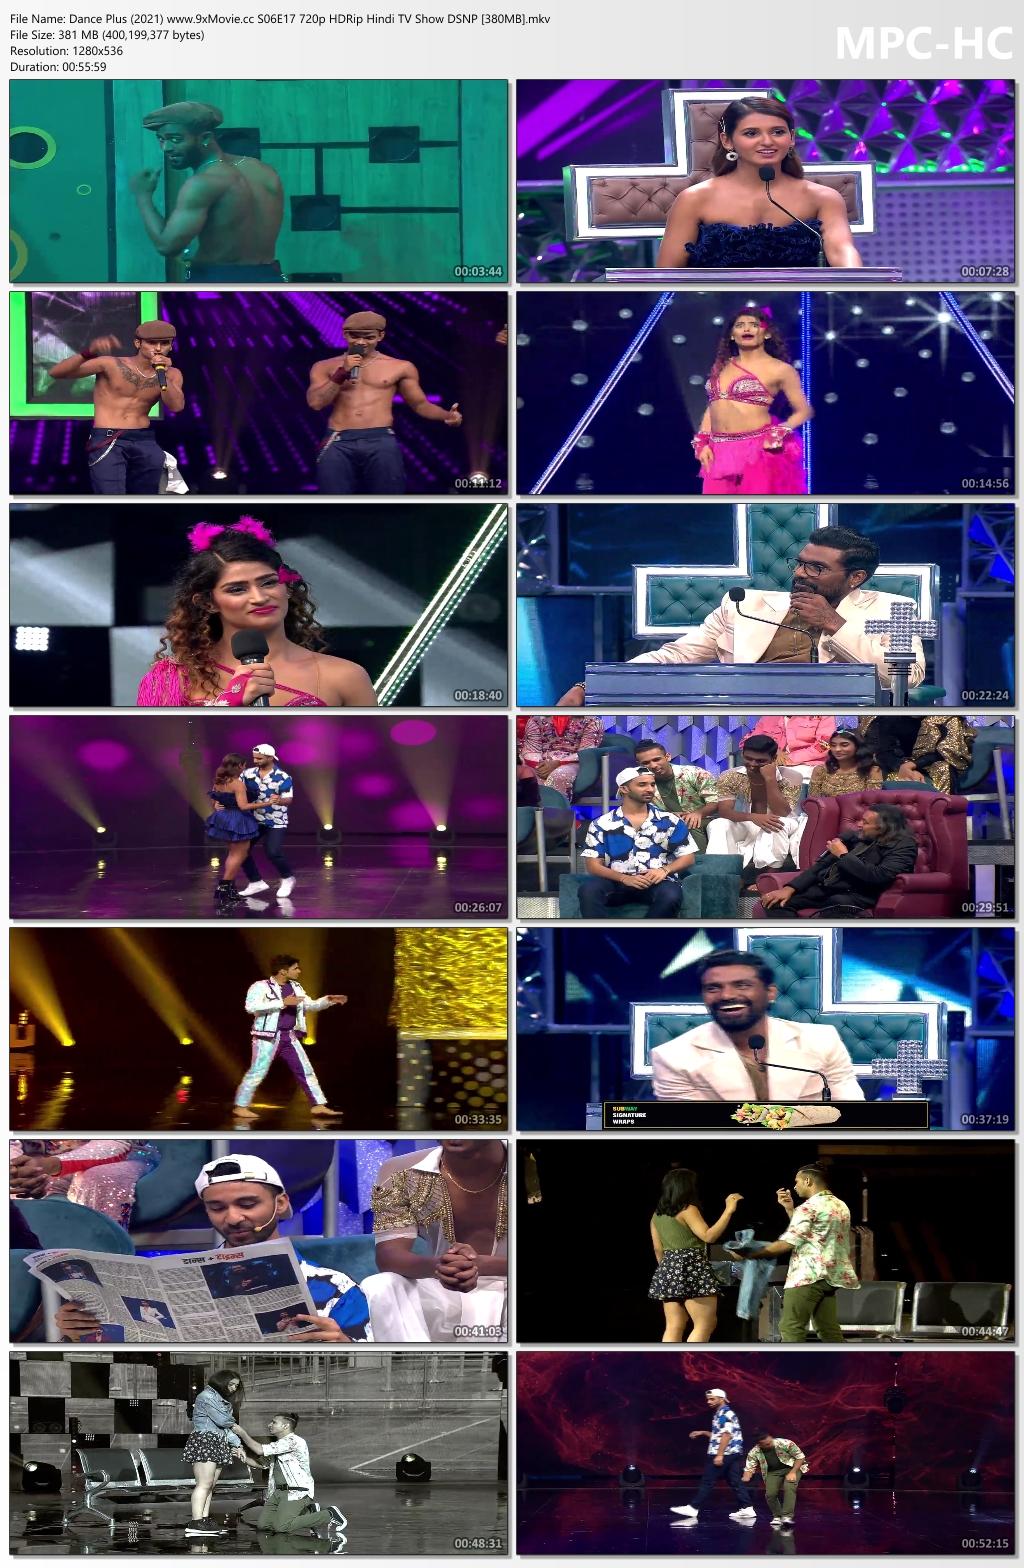 Dance-Plus-2021-www-9x-Movie-cc-S06-E17-720p-HDRip-Hindi-TV-Show-DSNP-380-MB-mkv